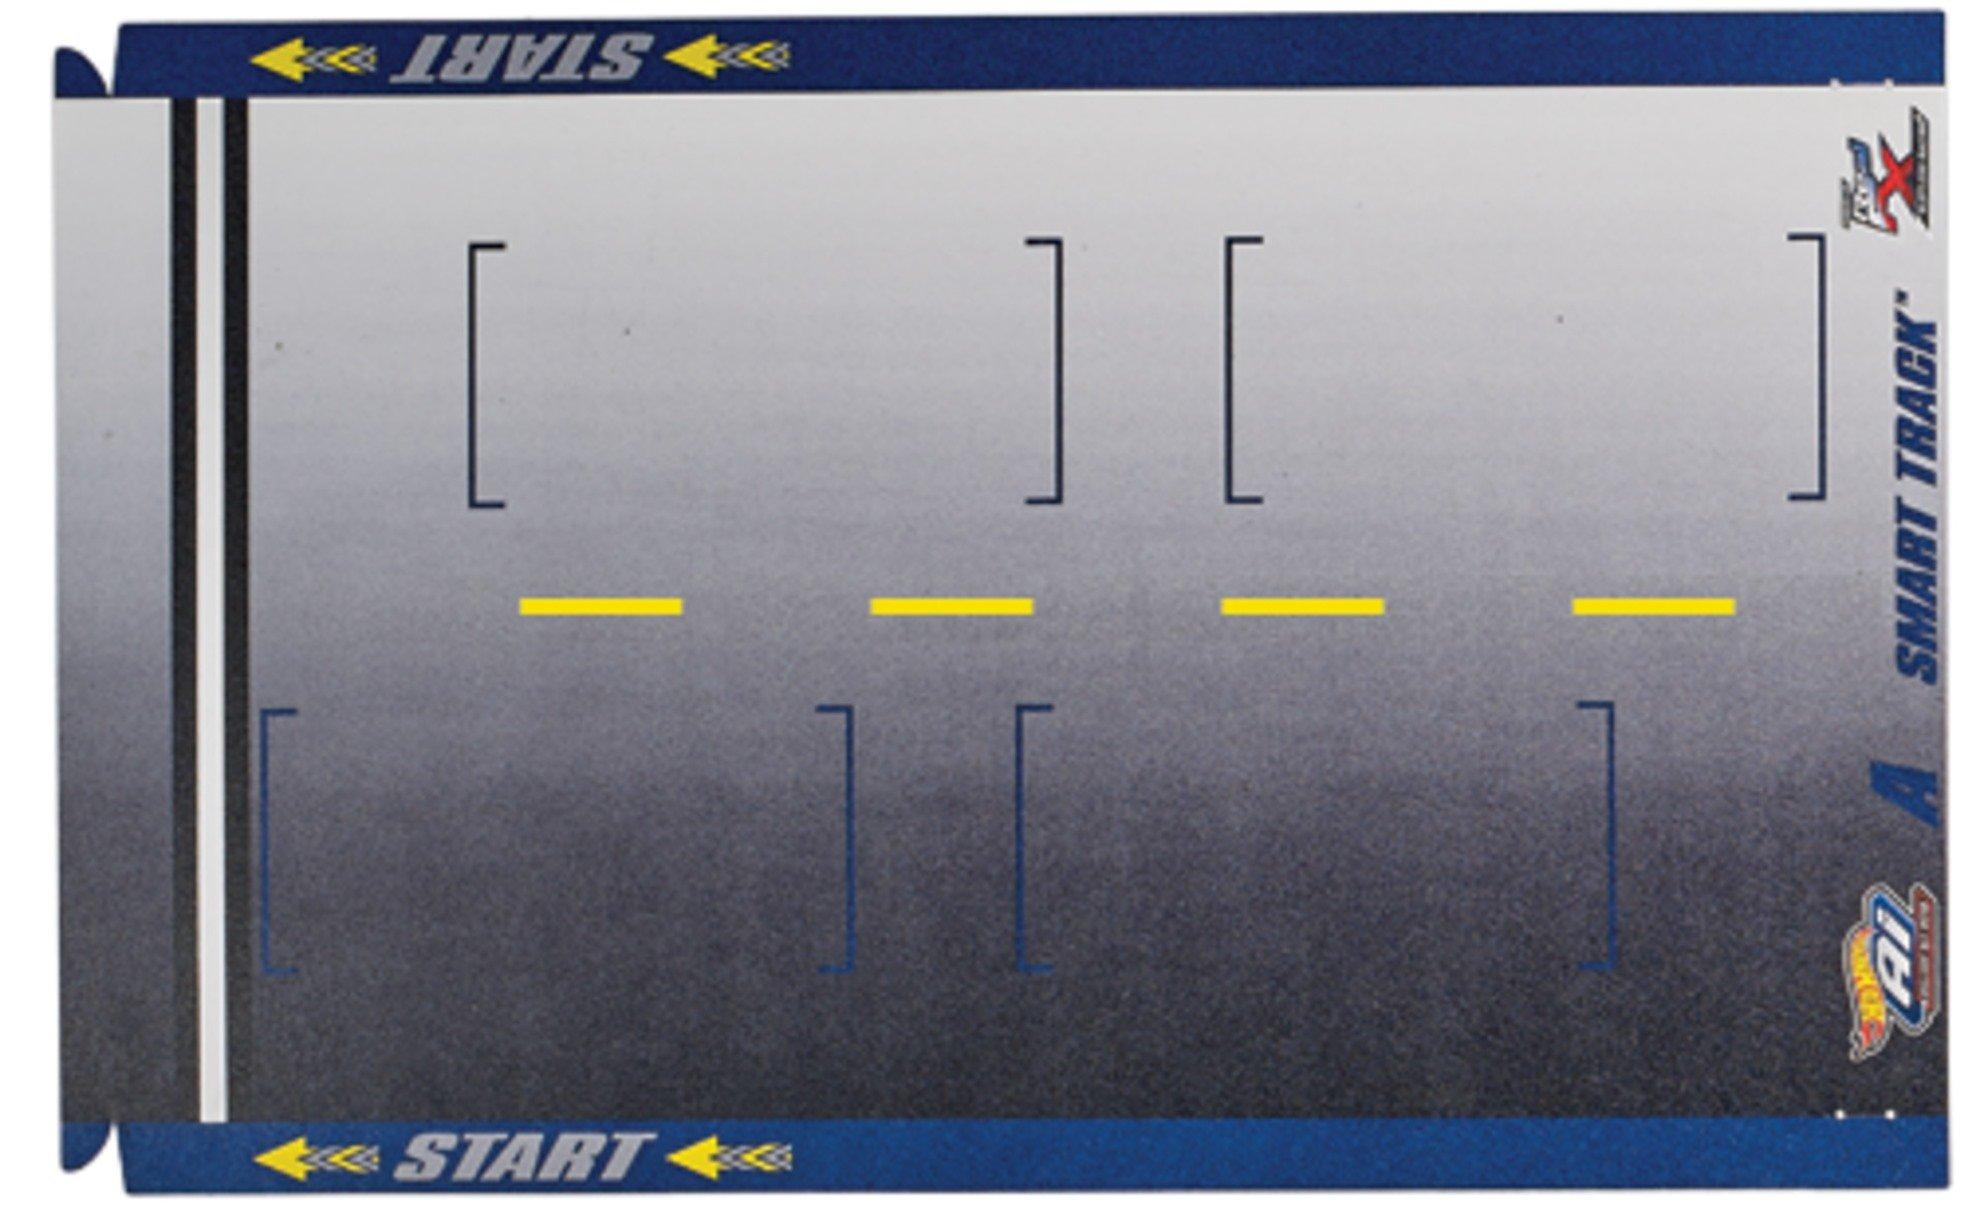 Hot Wheels Ai Starter Set Street Racing Edition by Hot Wheels (Image #18)